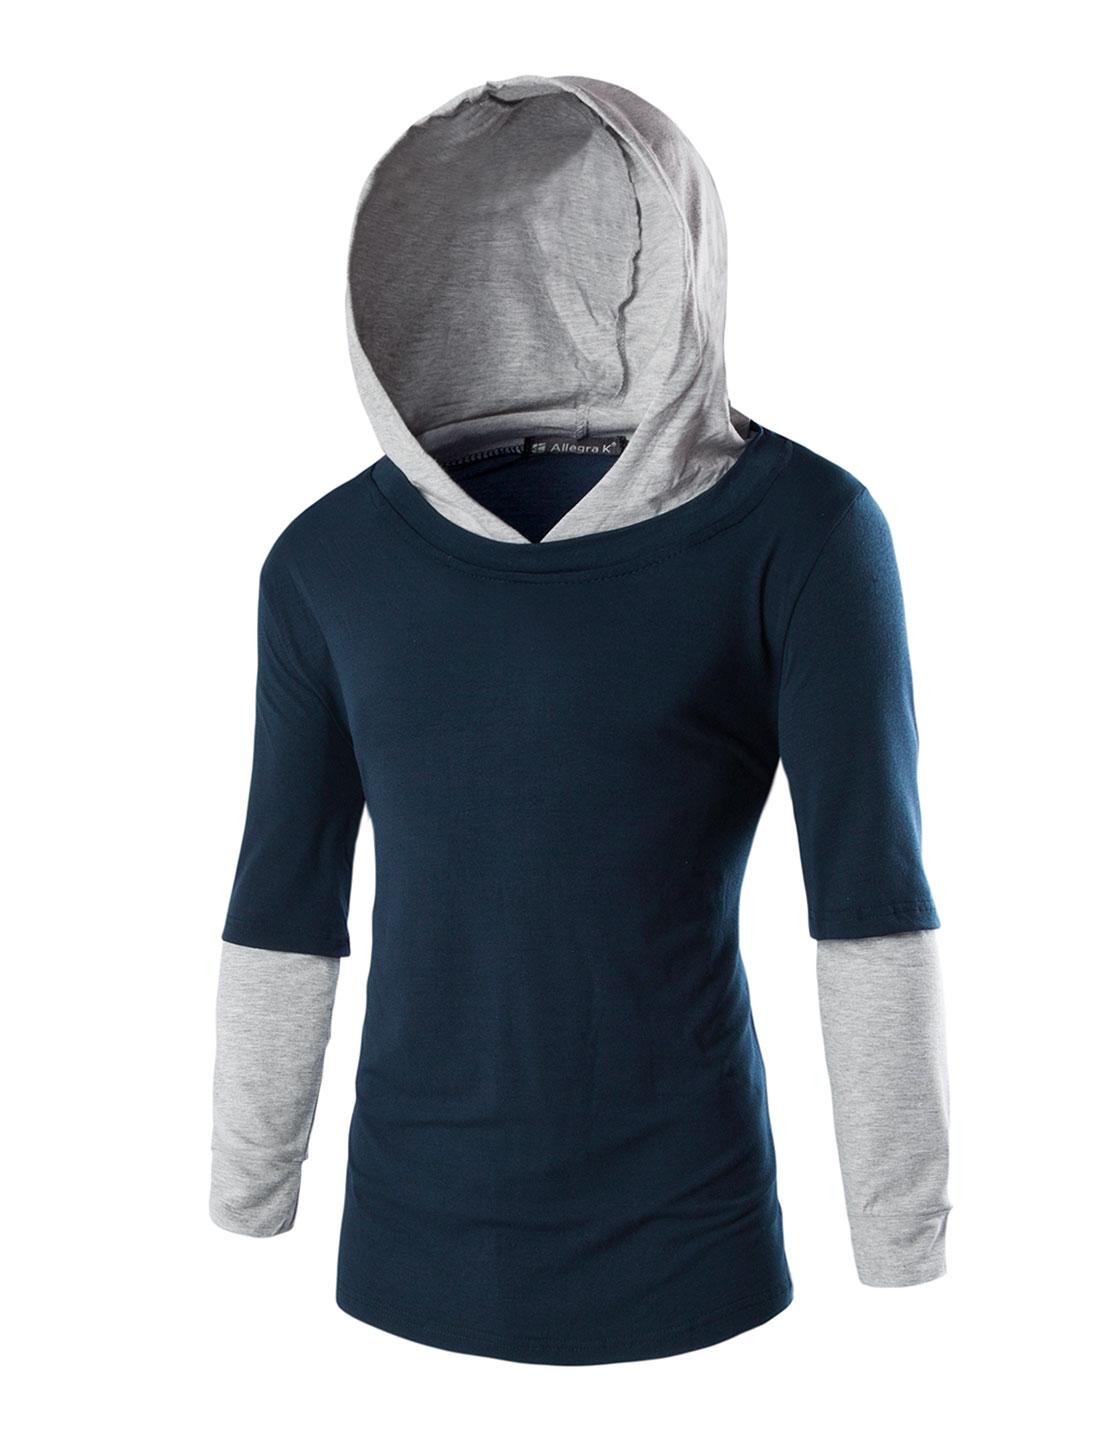 Men Long Sleeve Layered Design Casual Hoodies T-Shirt Navy Blue L